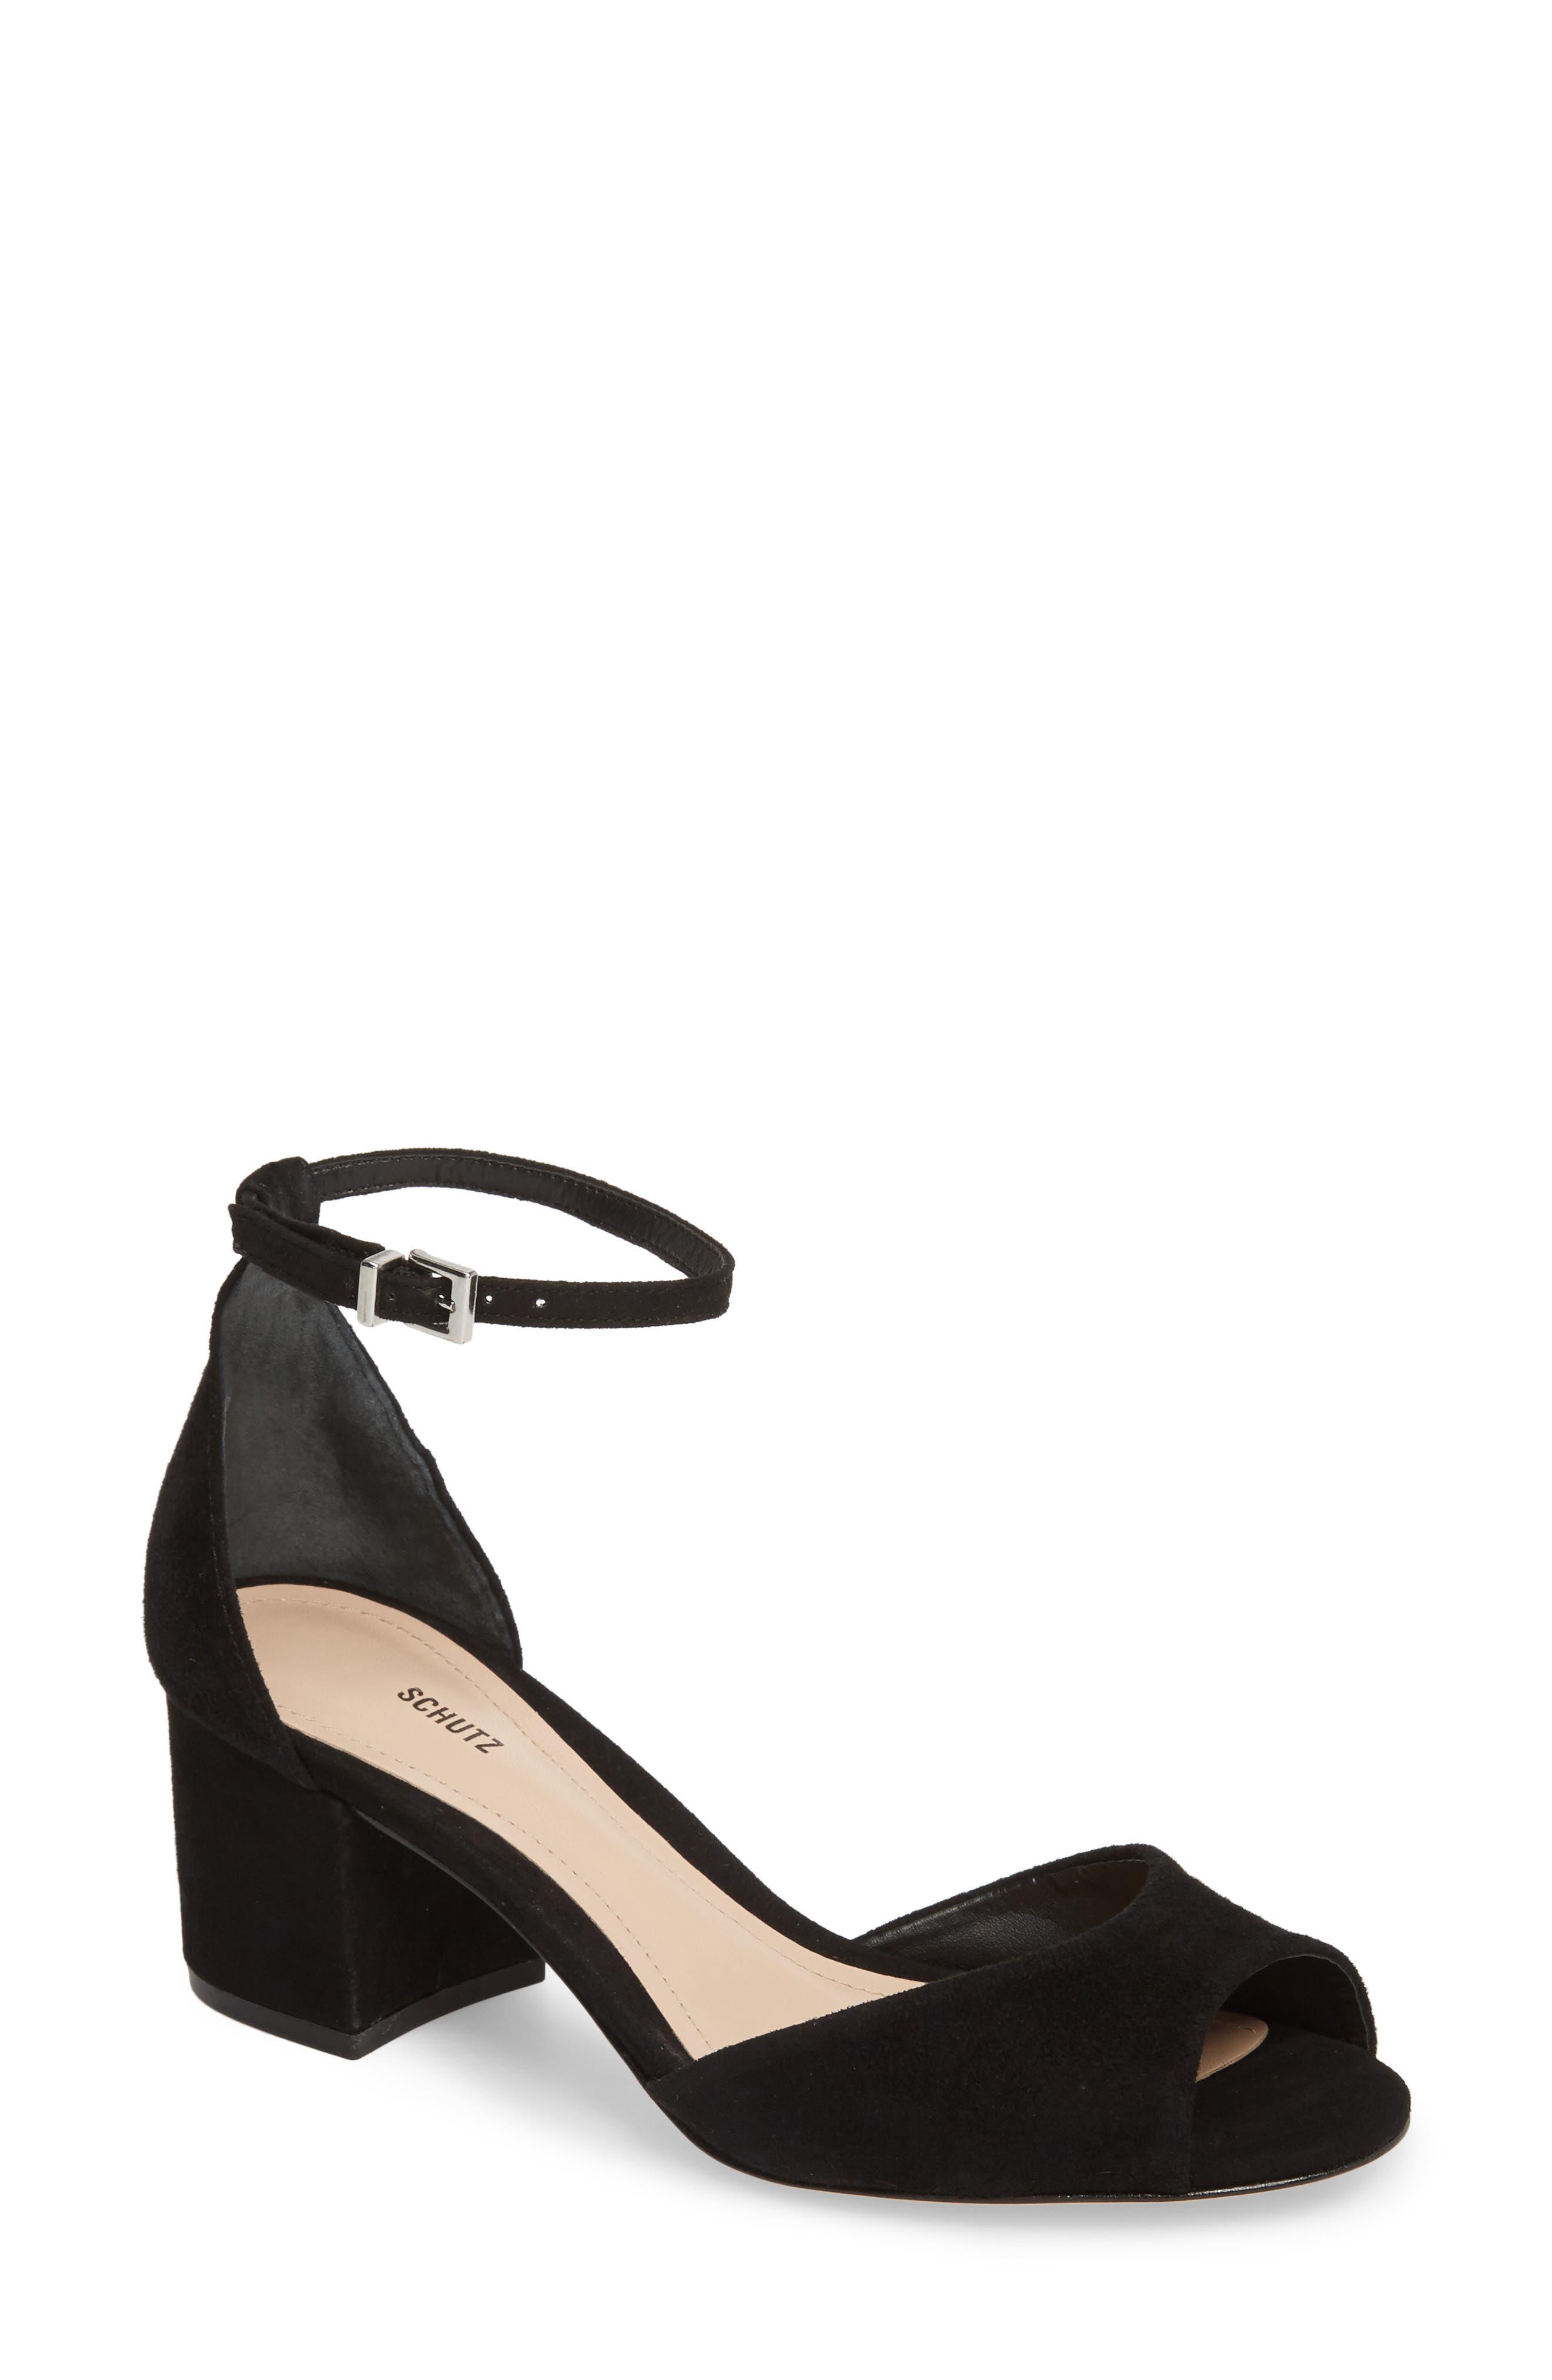 Roama Block Heel Sandal,                         Main,                         color, Black Suede